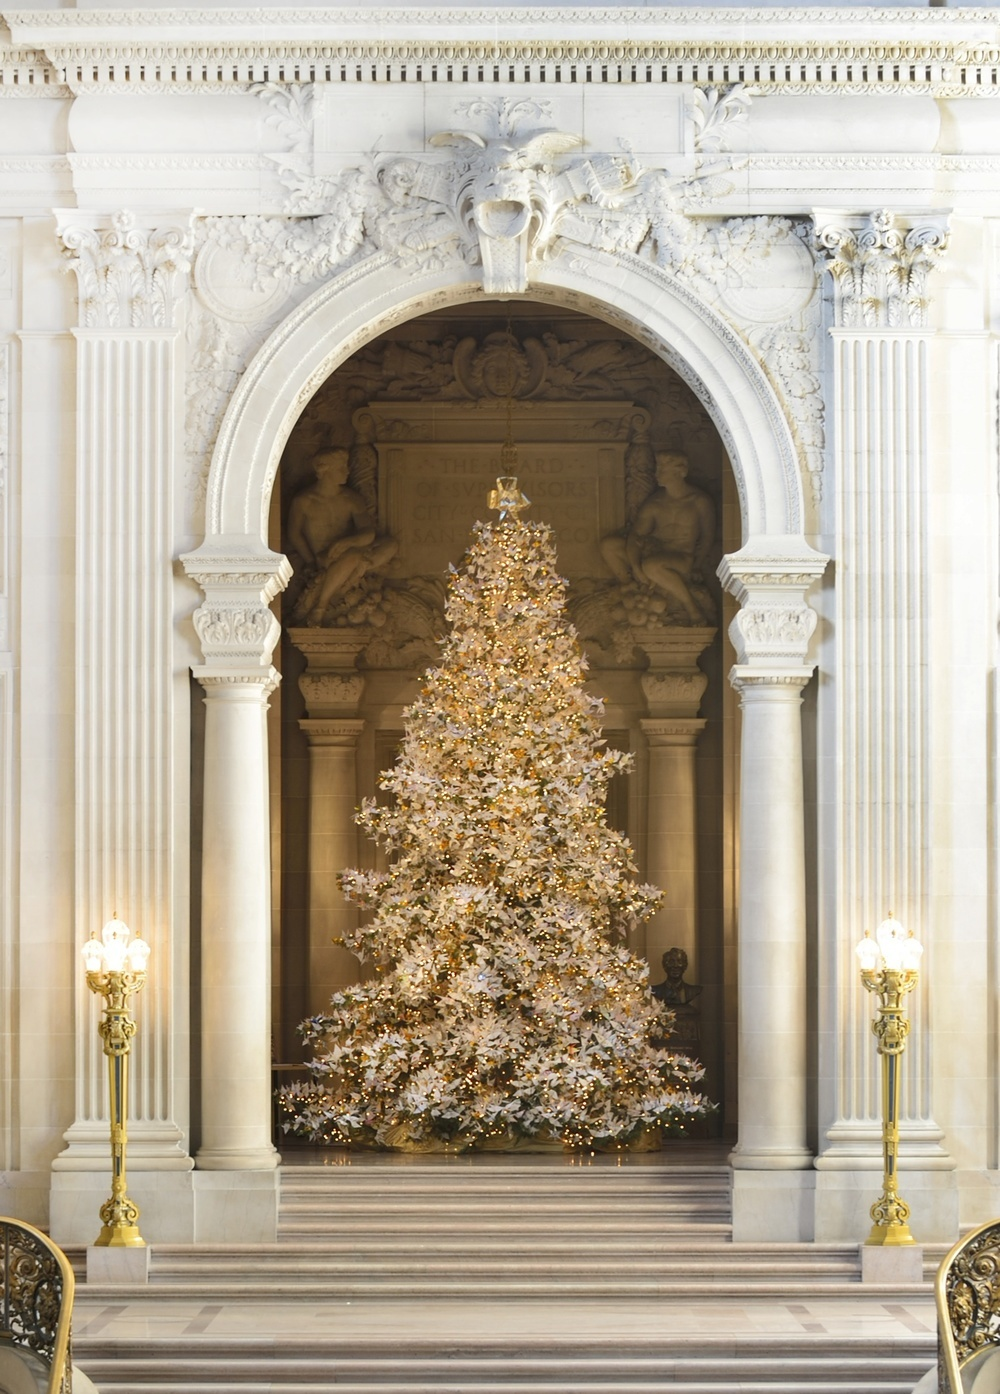 SF LIFE: Tree & Menorah Lightings, Gifting, Art Without Borders